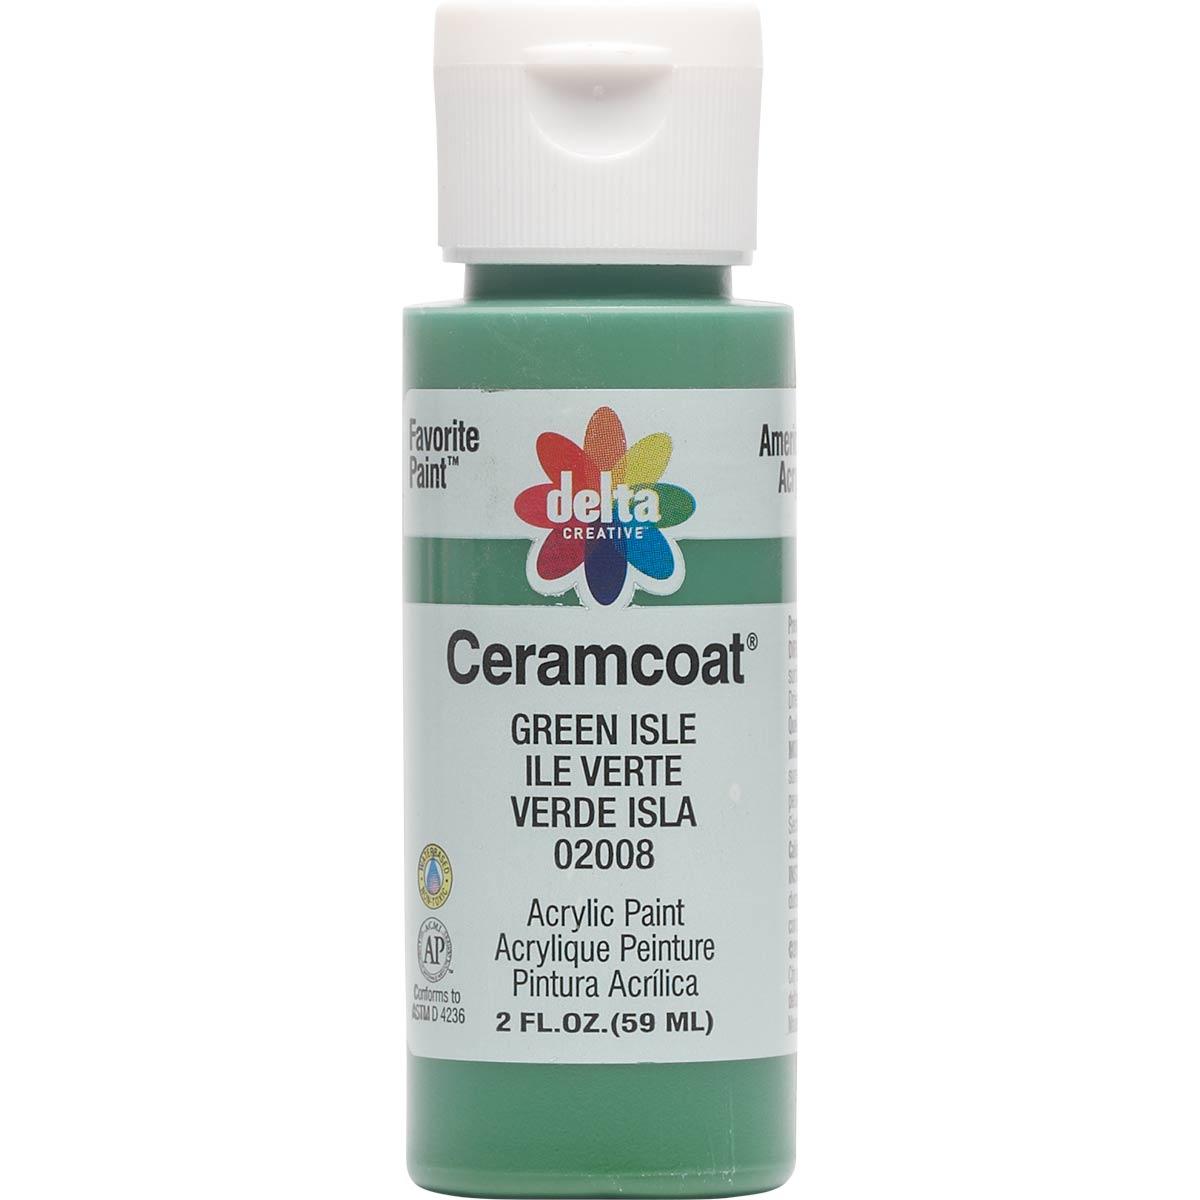 Delta Ceramcoat ® Acrylic Paint - Green Isle, 2 oz. - 020080202W